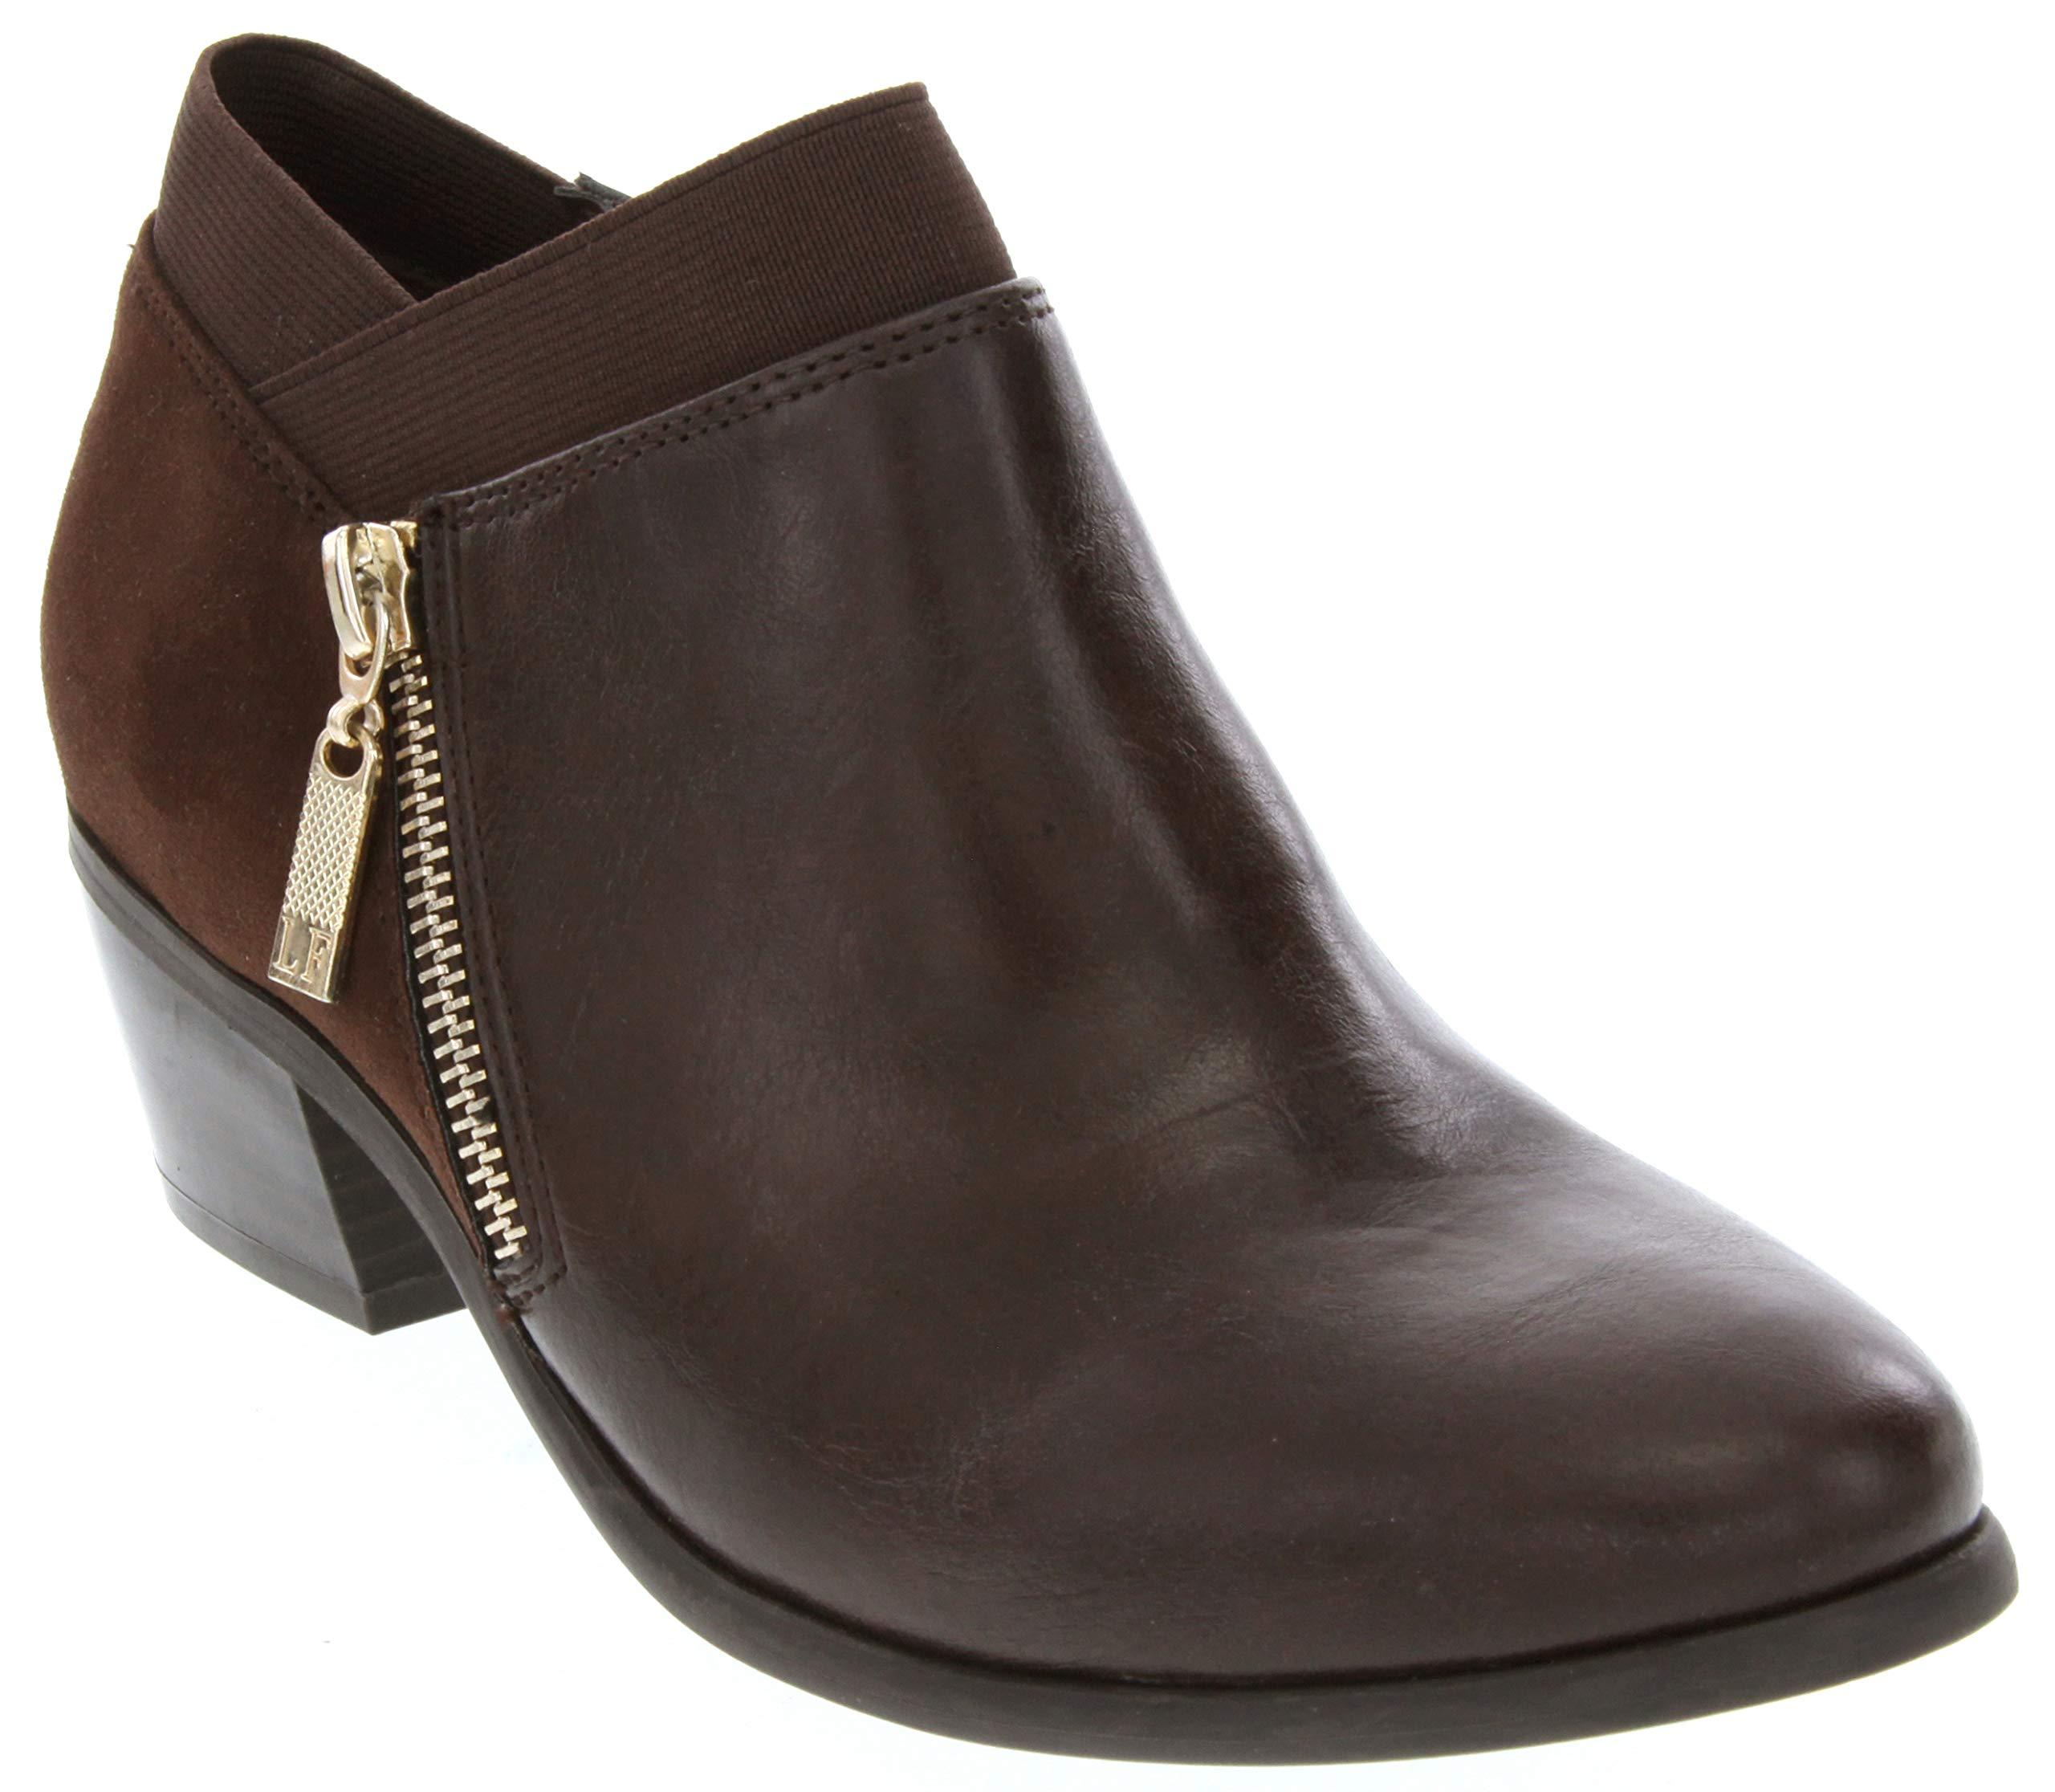 London Fog Womens Harper Dress Boot Brown 11